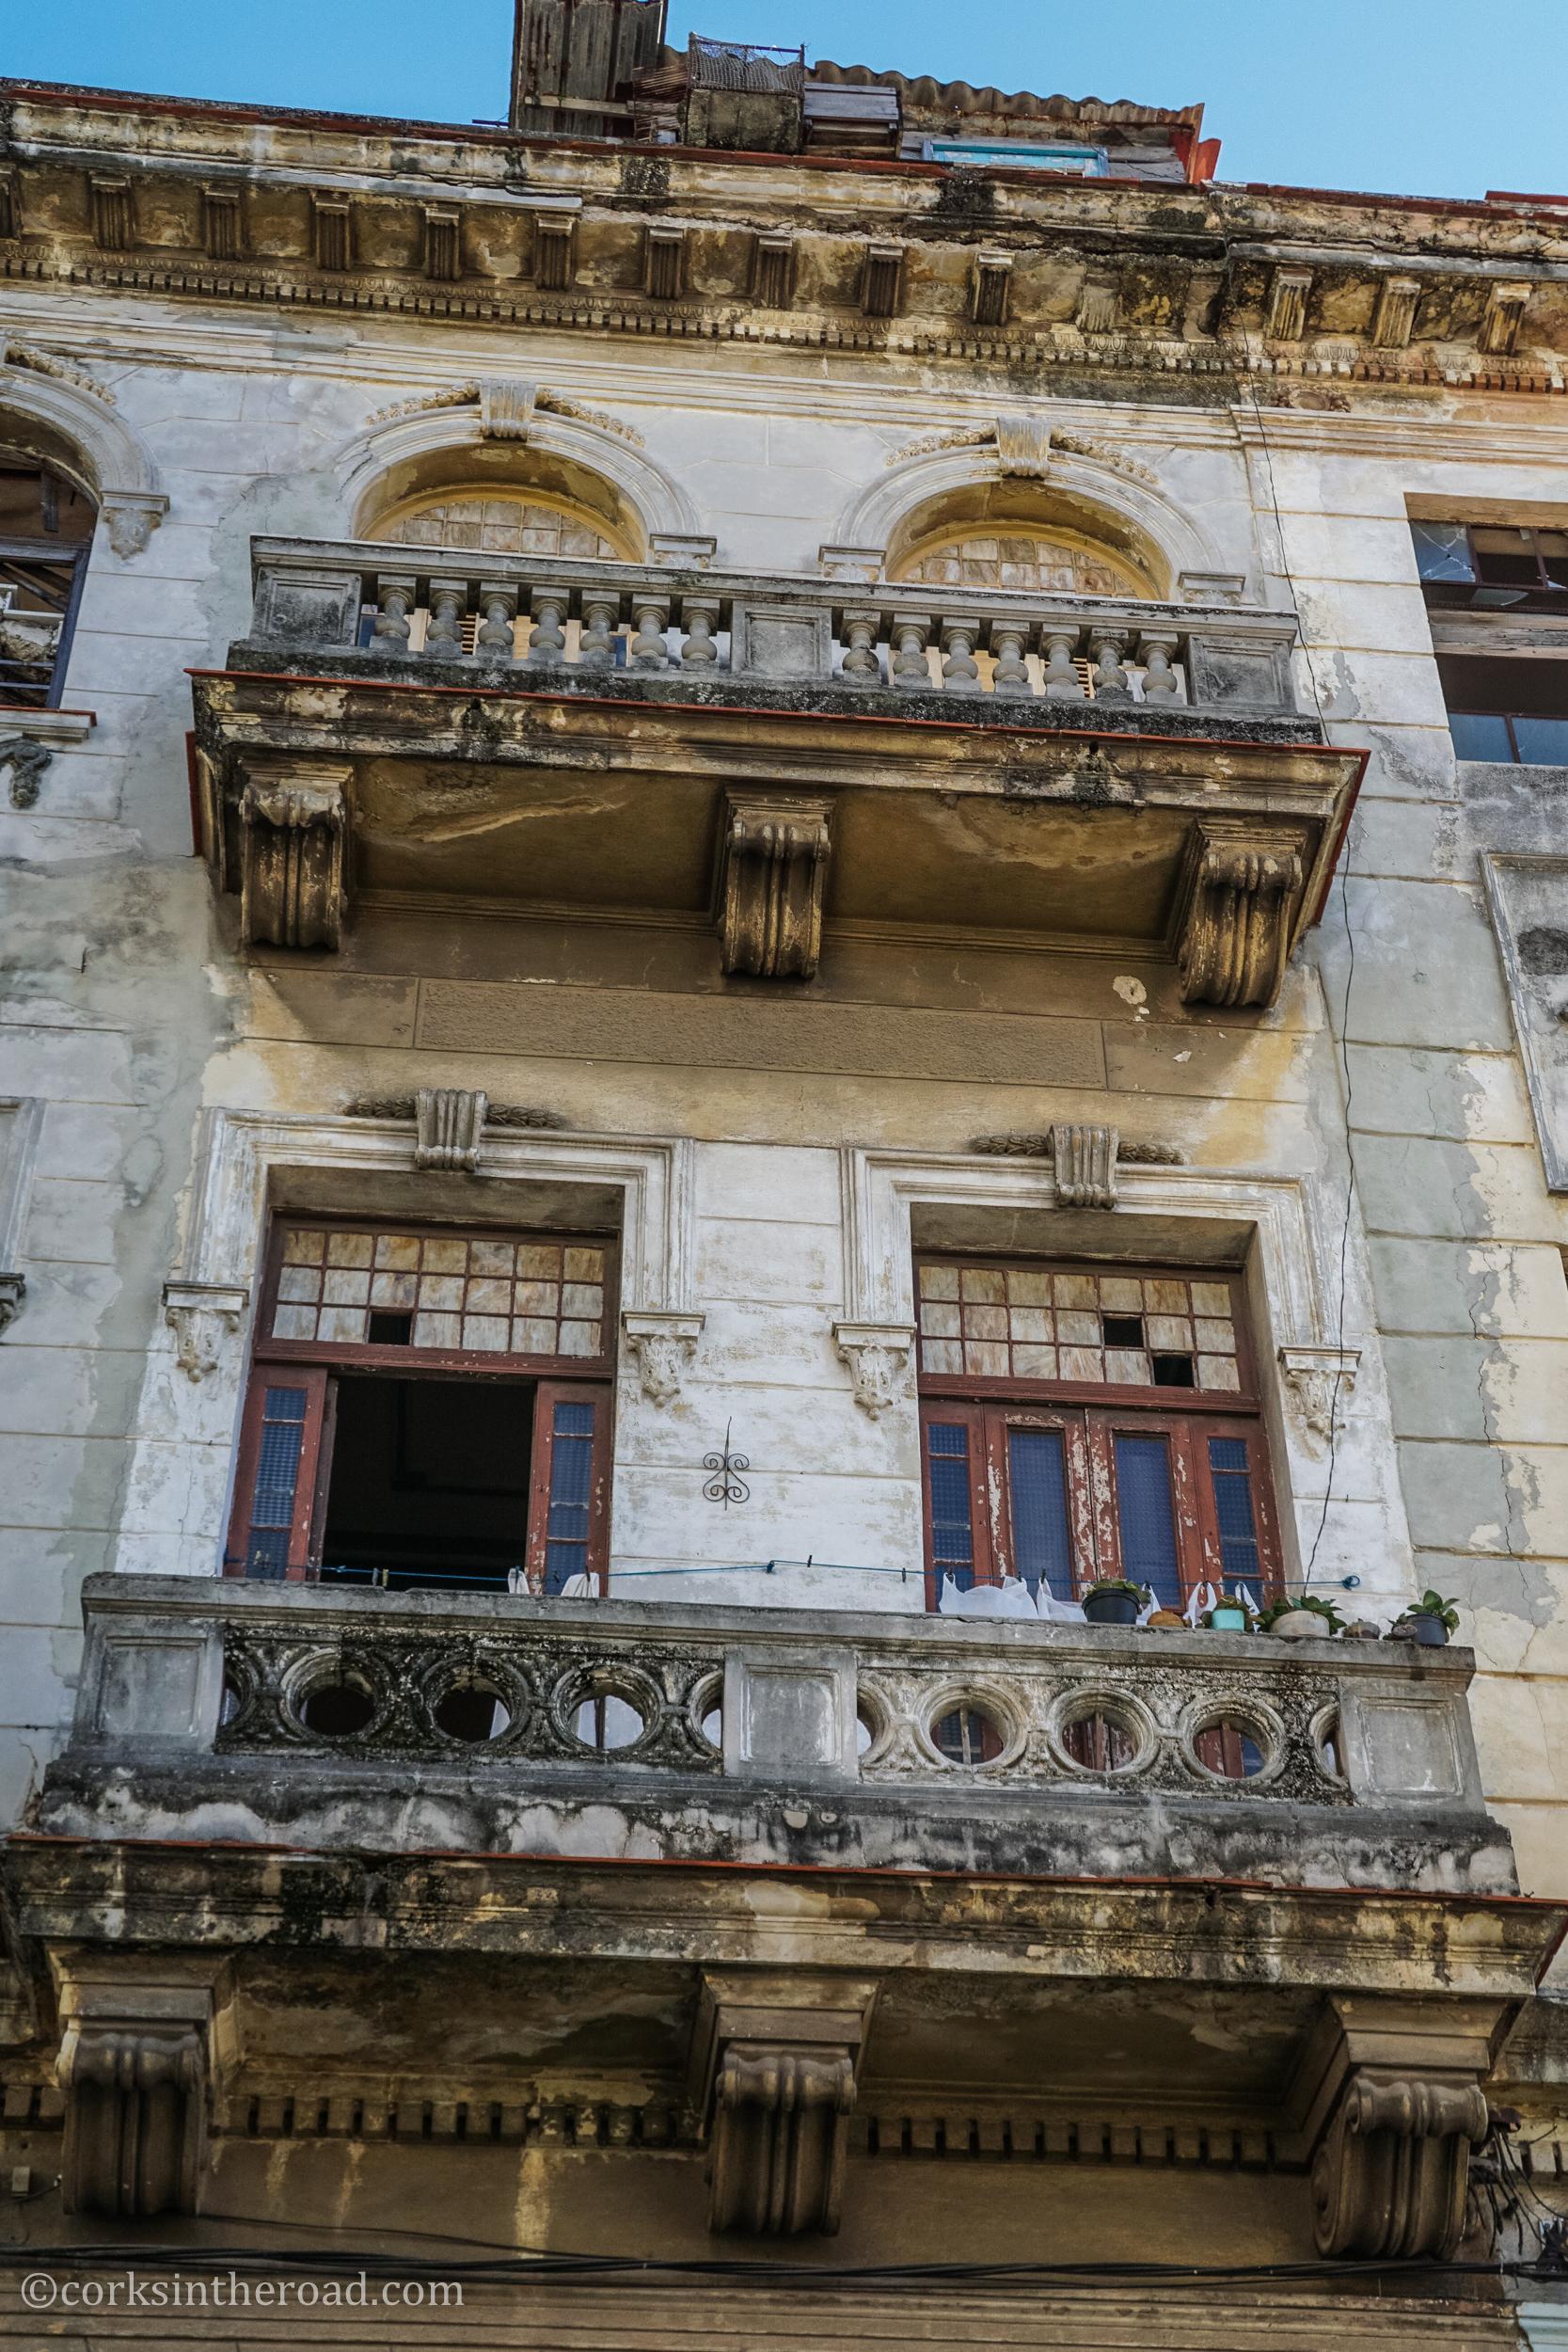 Architecture, Corksintheroad, Cuba, Havana-9.jpg